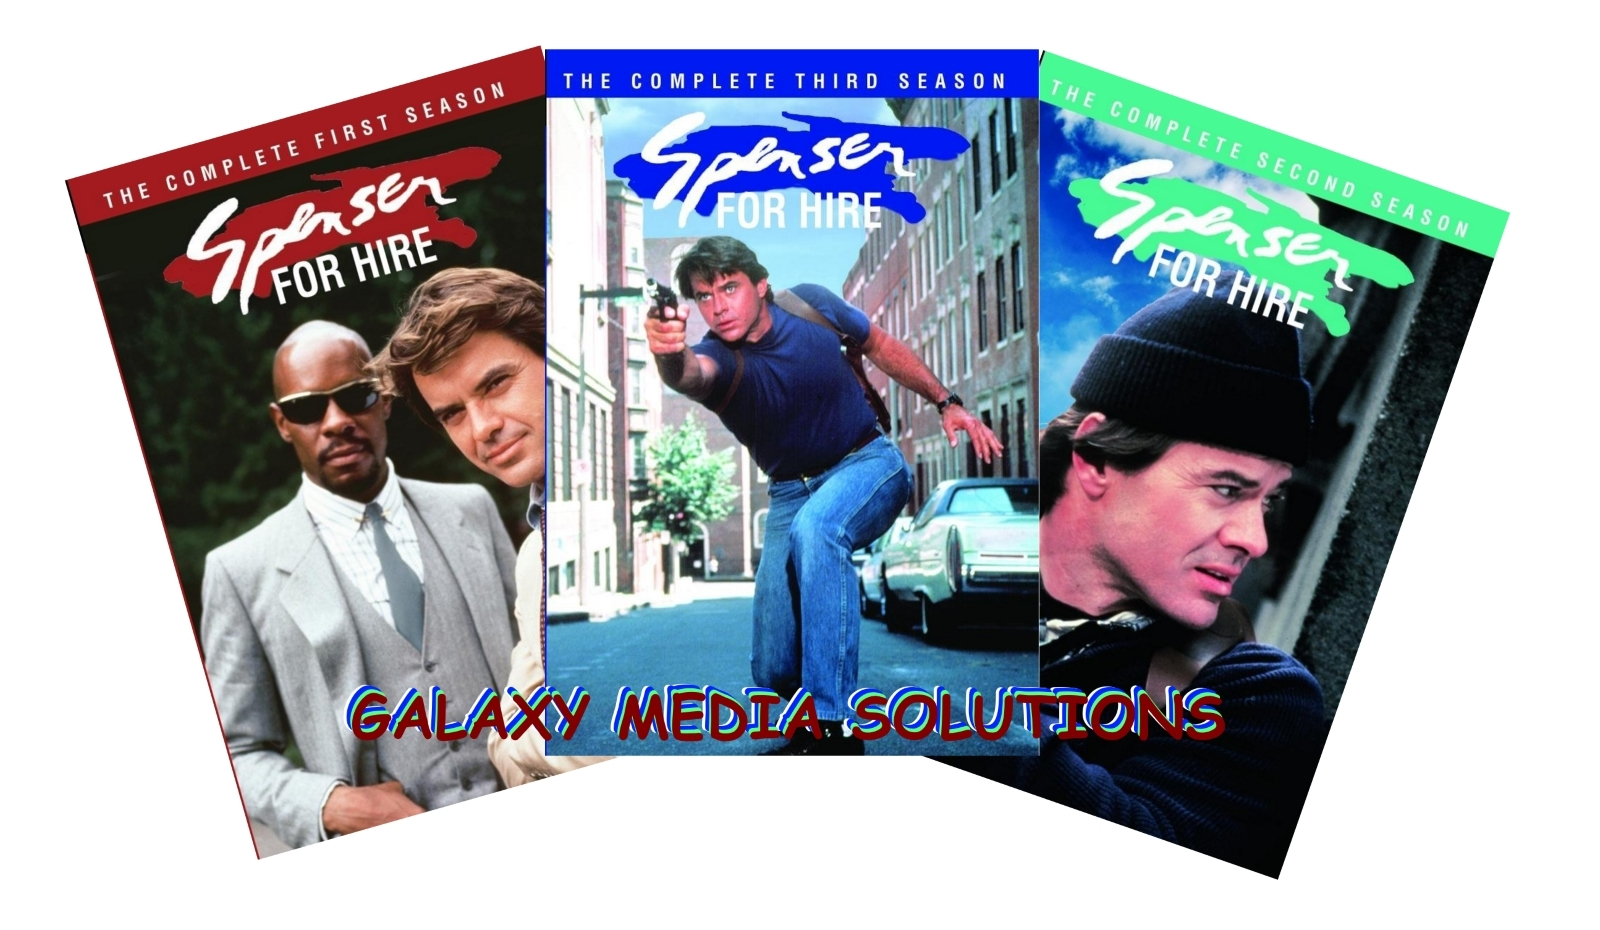 Spenser for hire season 1 3 one  three dvd bundle